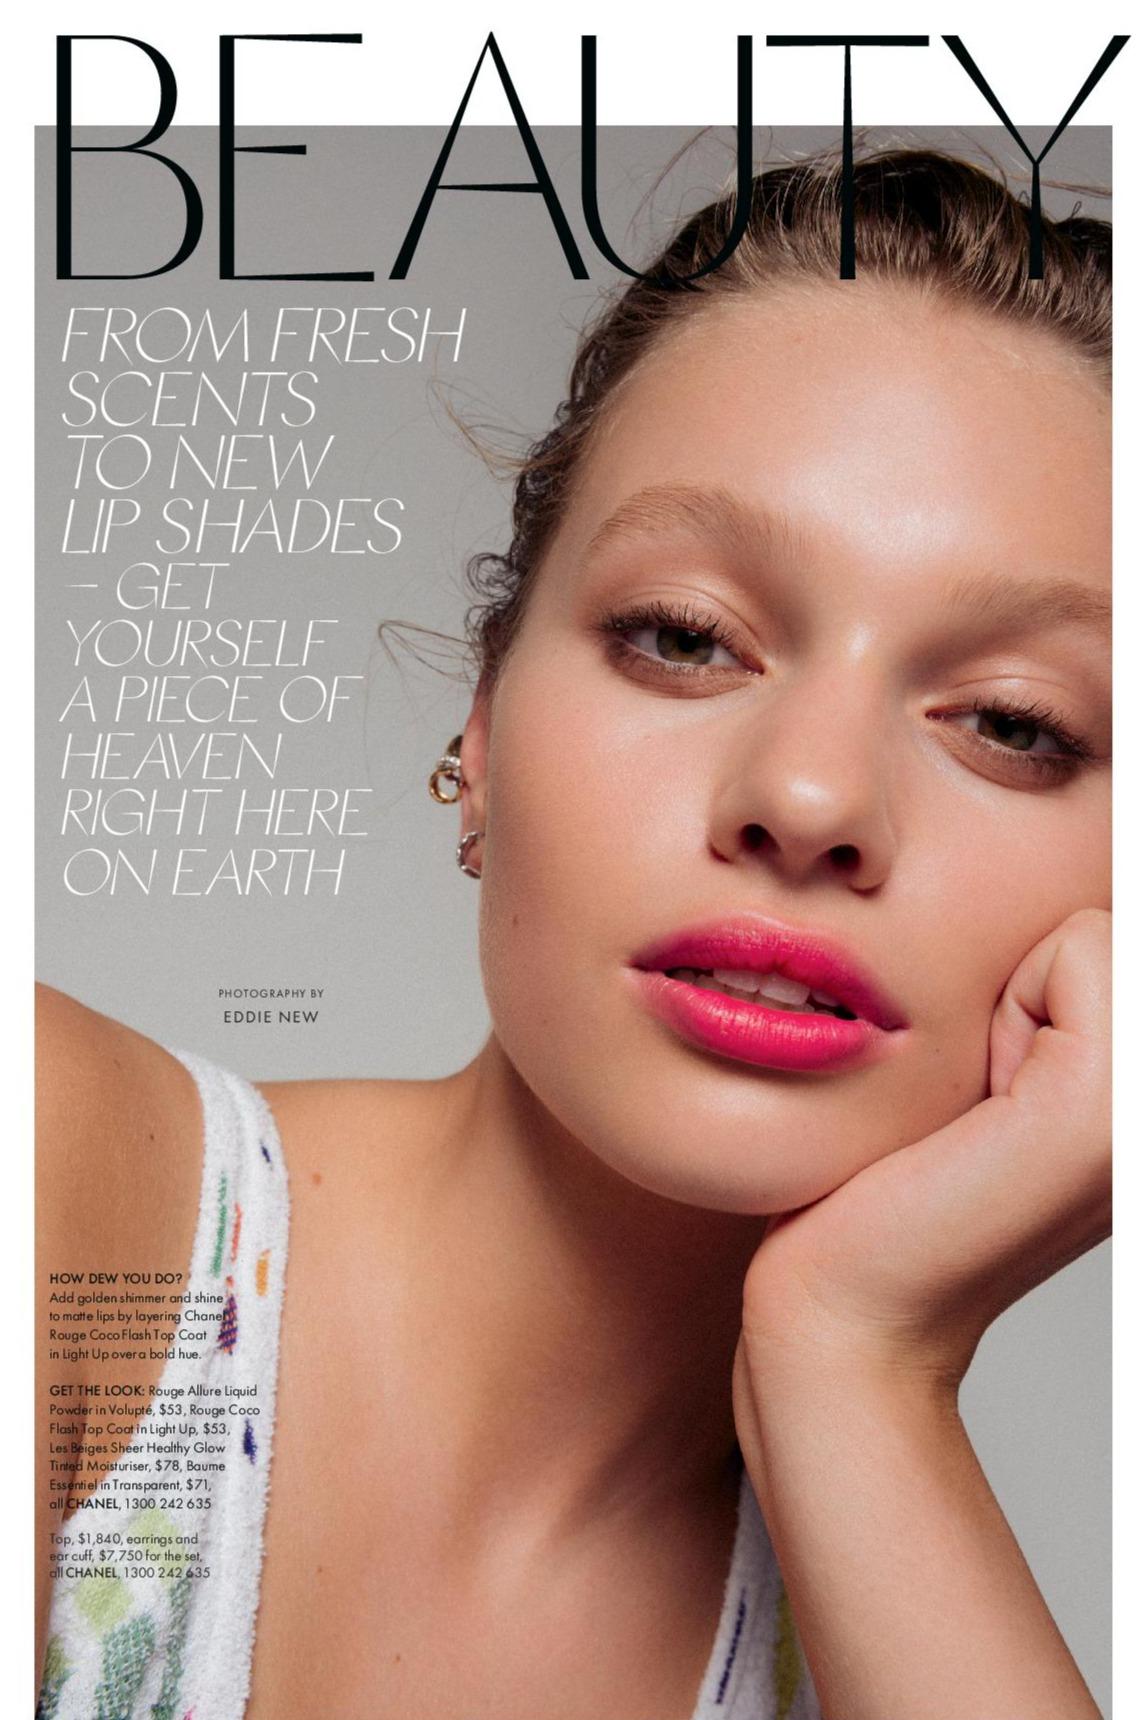 Tiahnee Skrijel for Elle Australia | Pride Models news